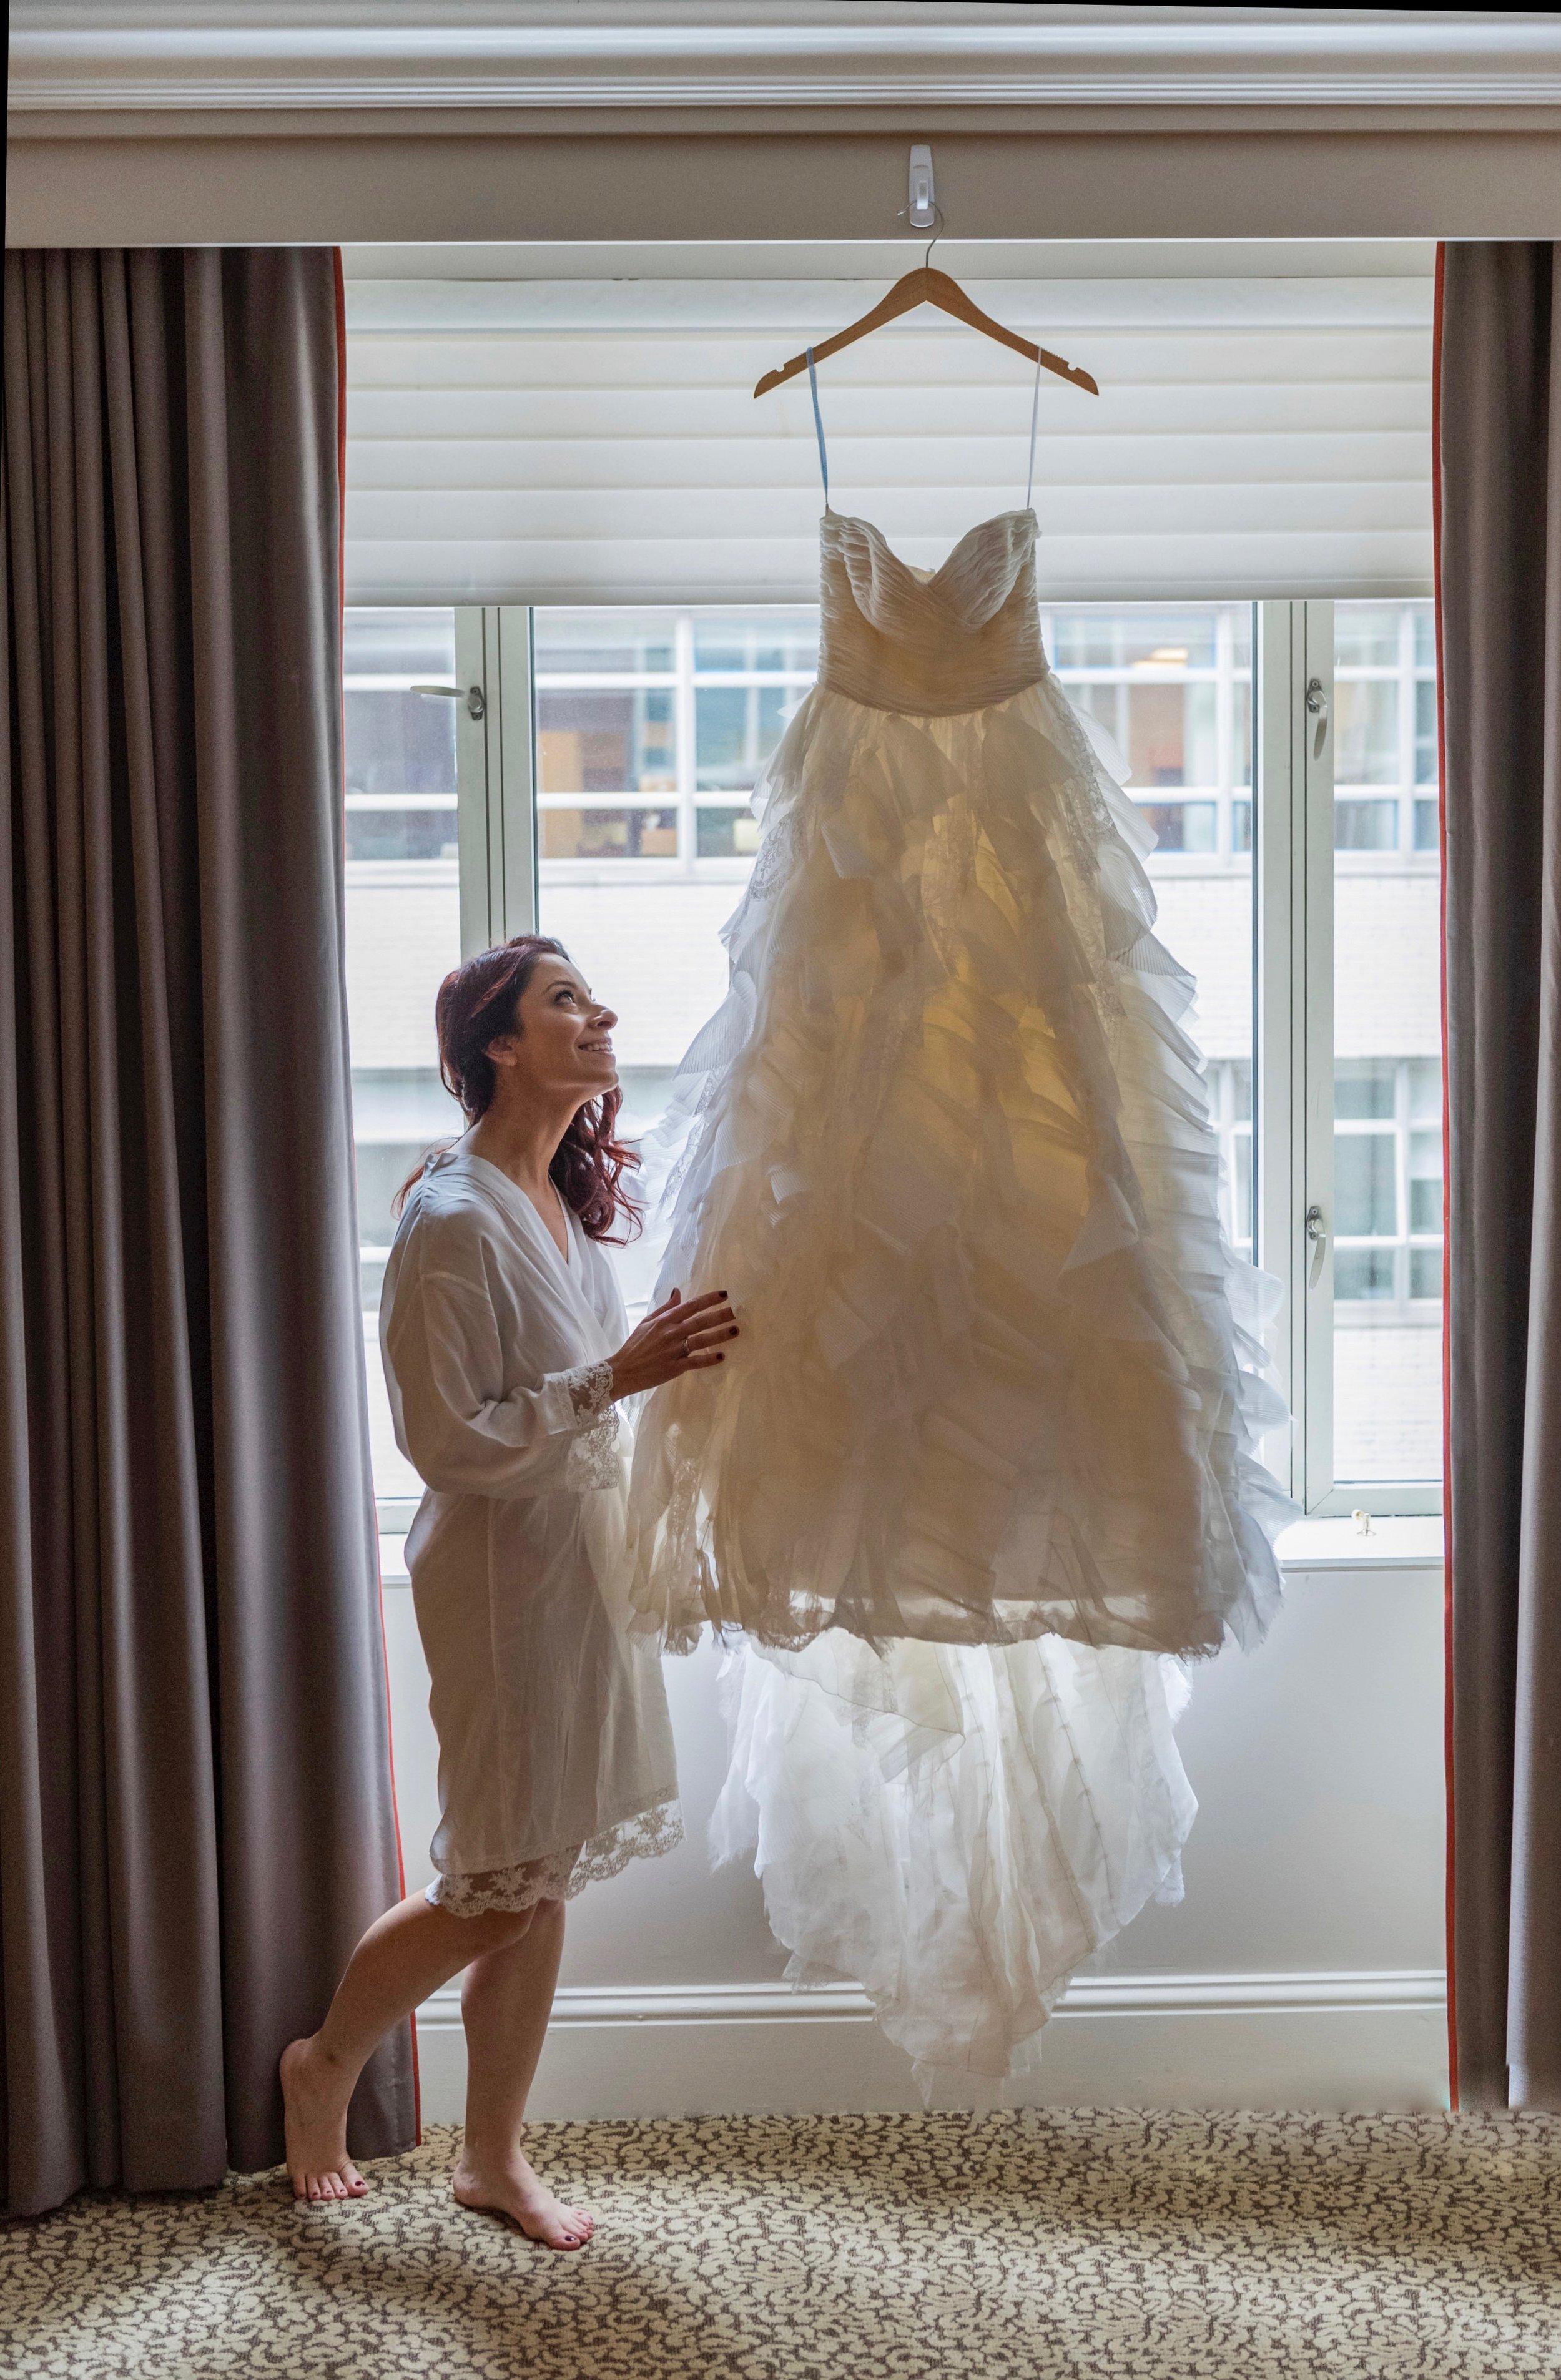 Barbara&GiribyUnveiled-Weddings.com(155of1007)_Retouched.jpeg